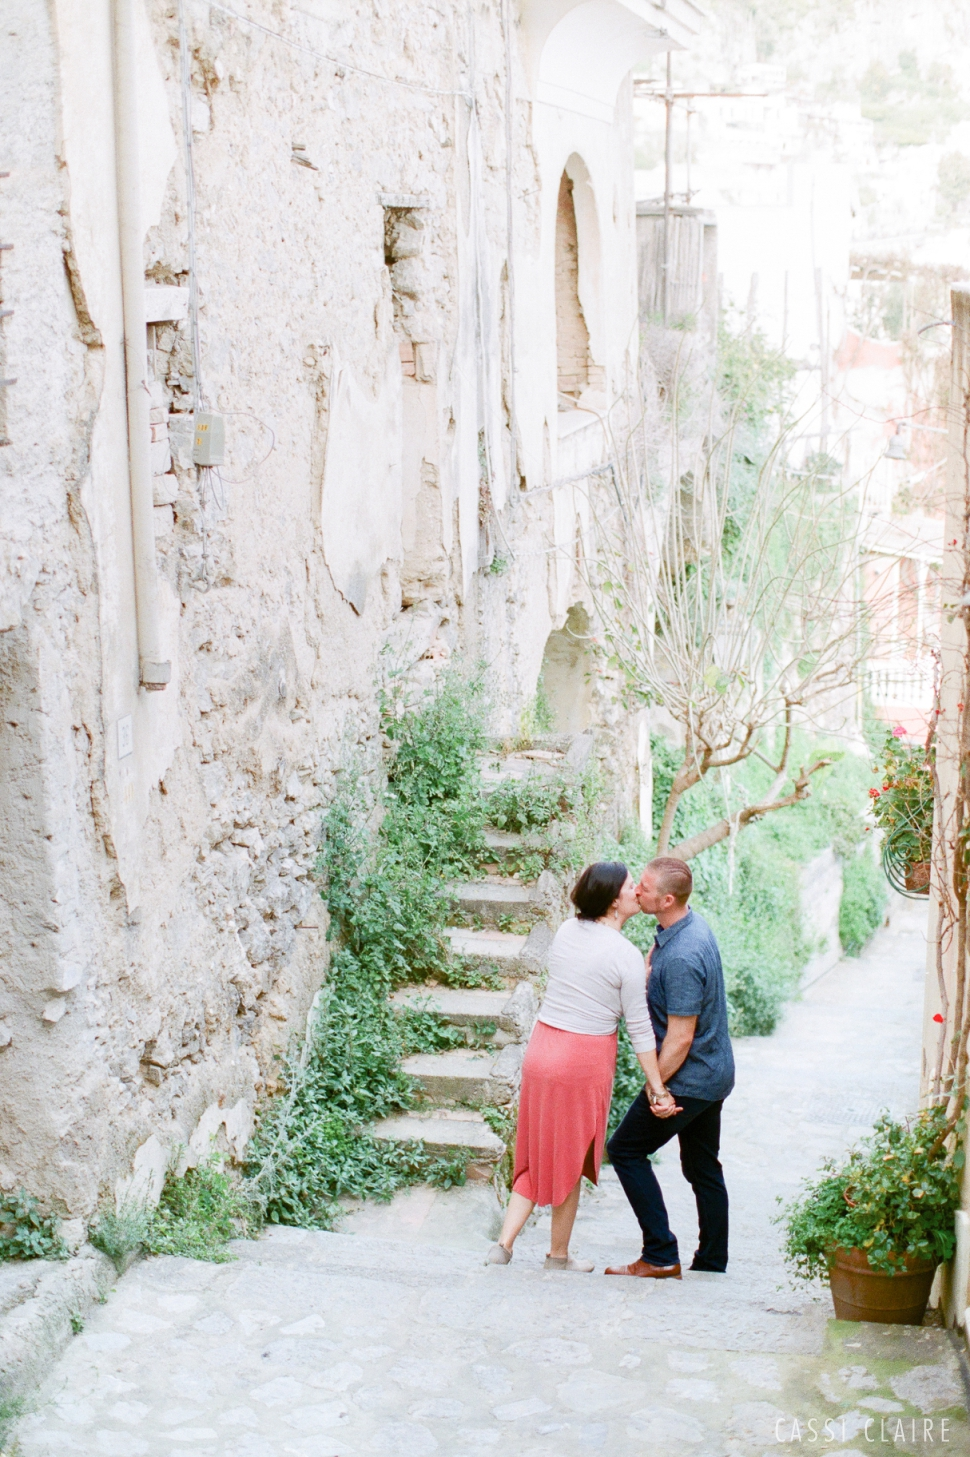 Positano-Anniversary-Photos_CassiClaire_08.jpg